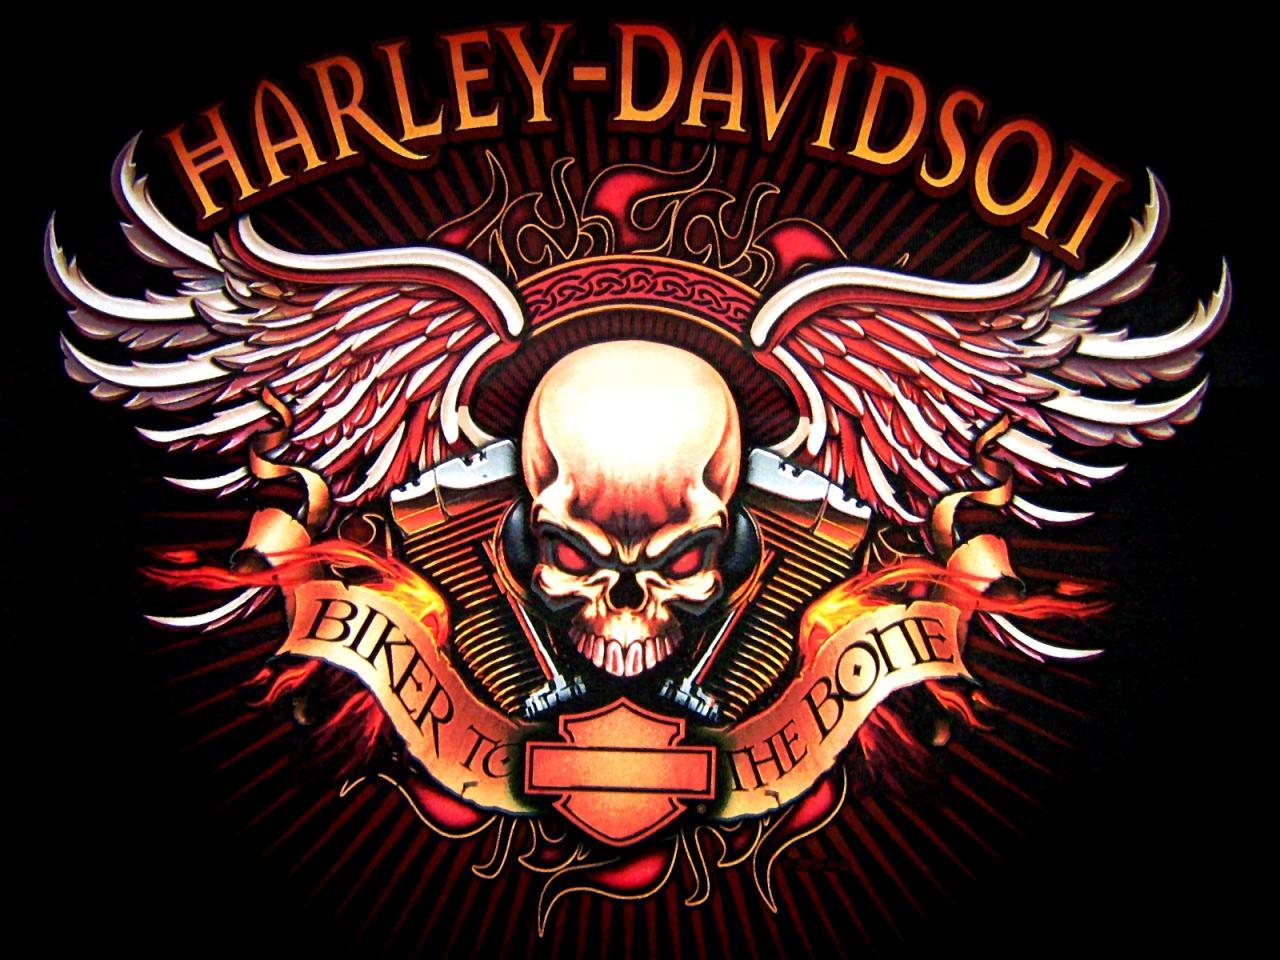 Harley Davidson logo skull bikes motorcycle wallpaper | 1600x1200 ...